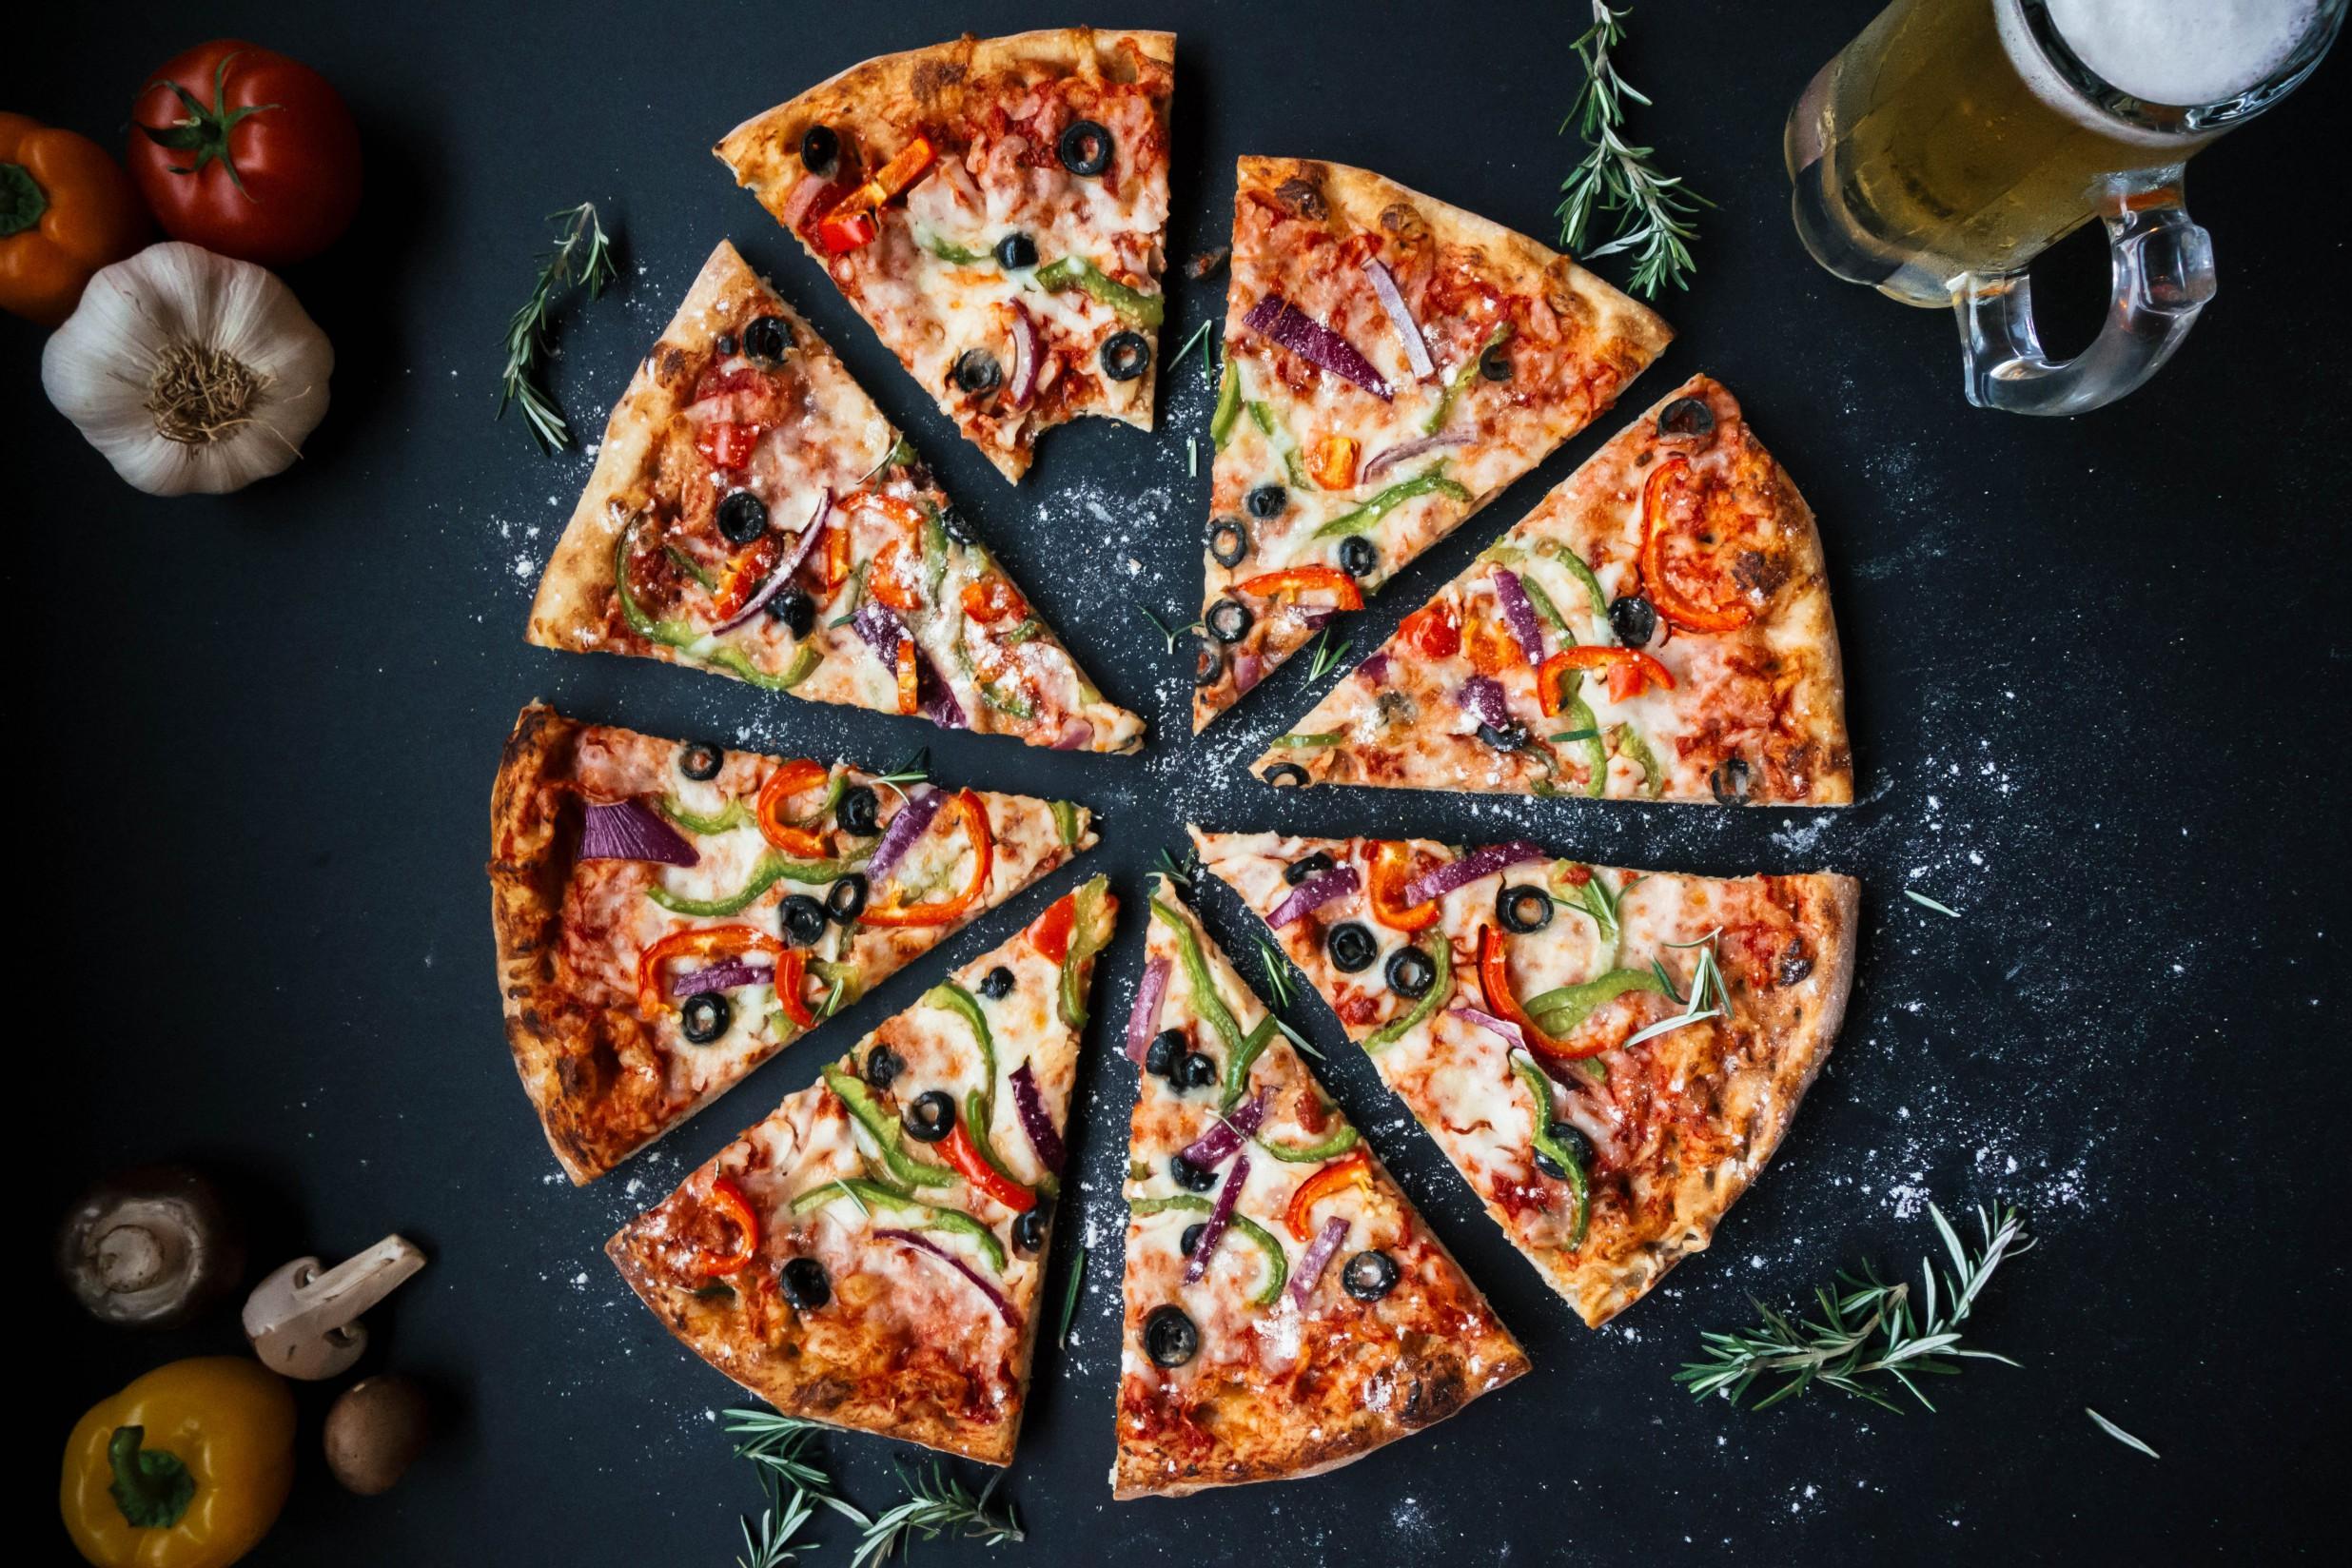 Katera vrsta pice je vaša najljubša?